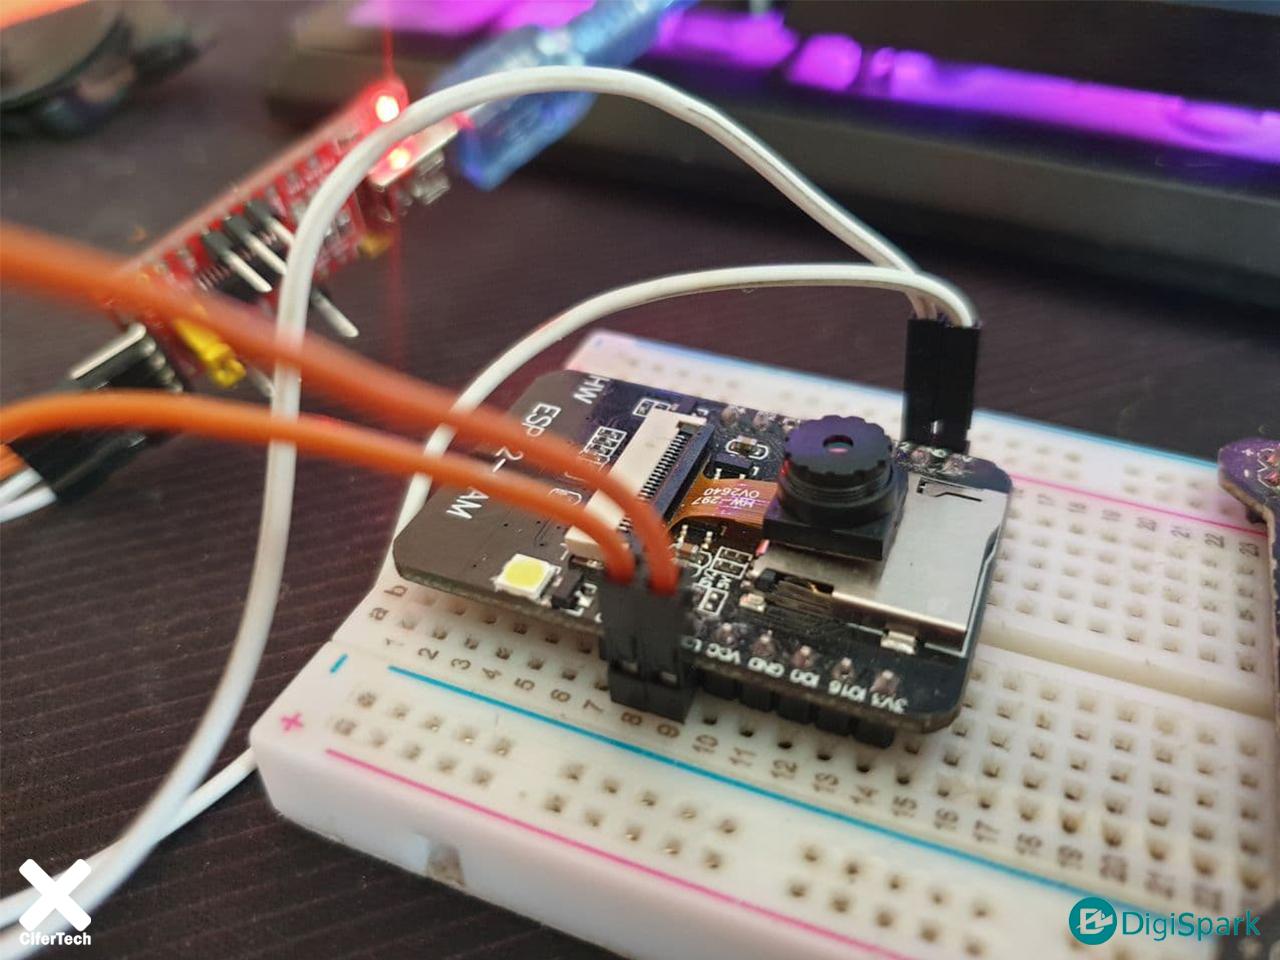 نحوه کار تشخیص اشیا با دوربین ESP-Cam - دیجی اسپارک